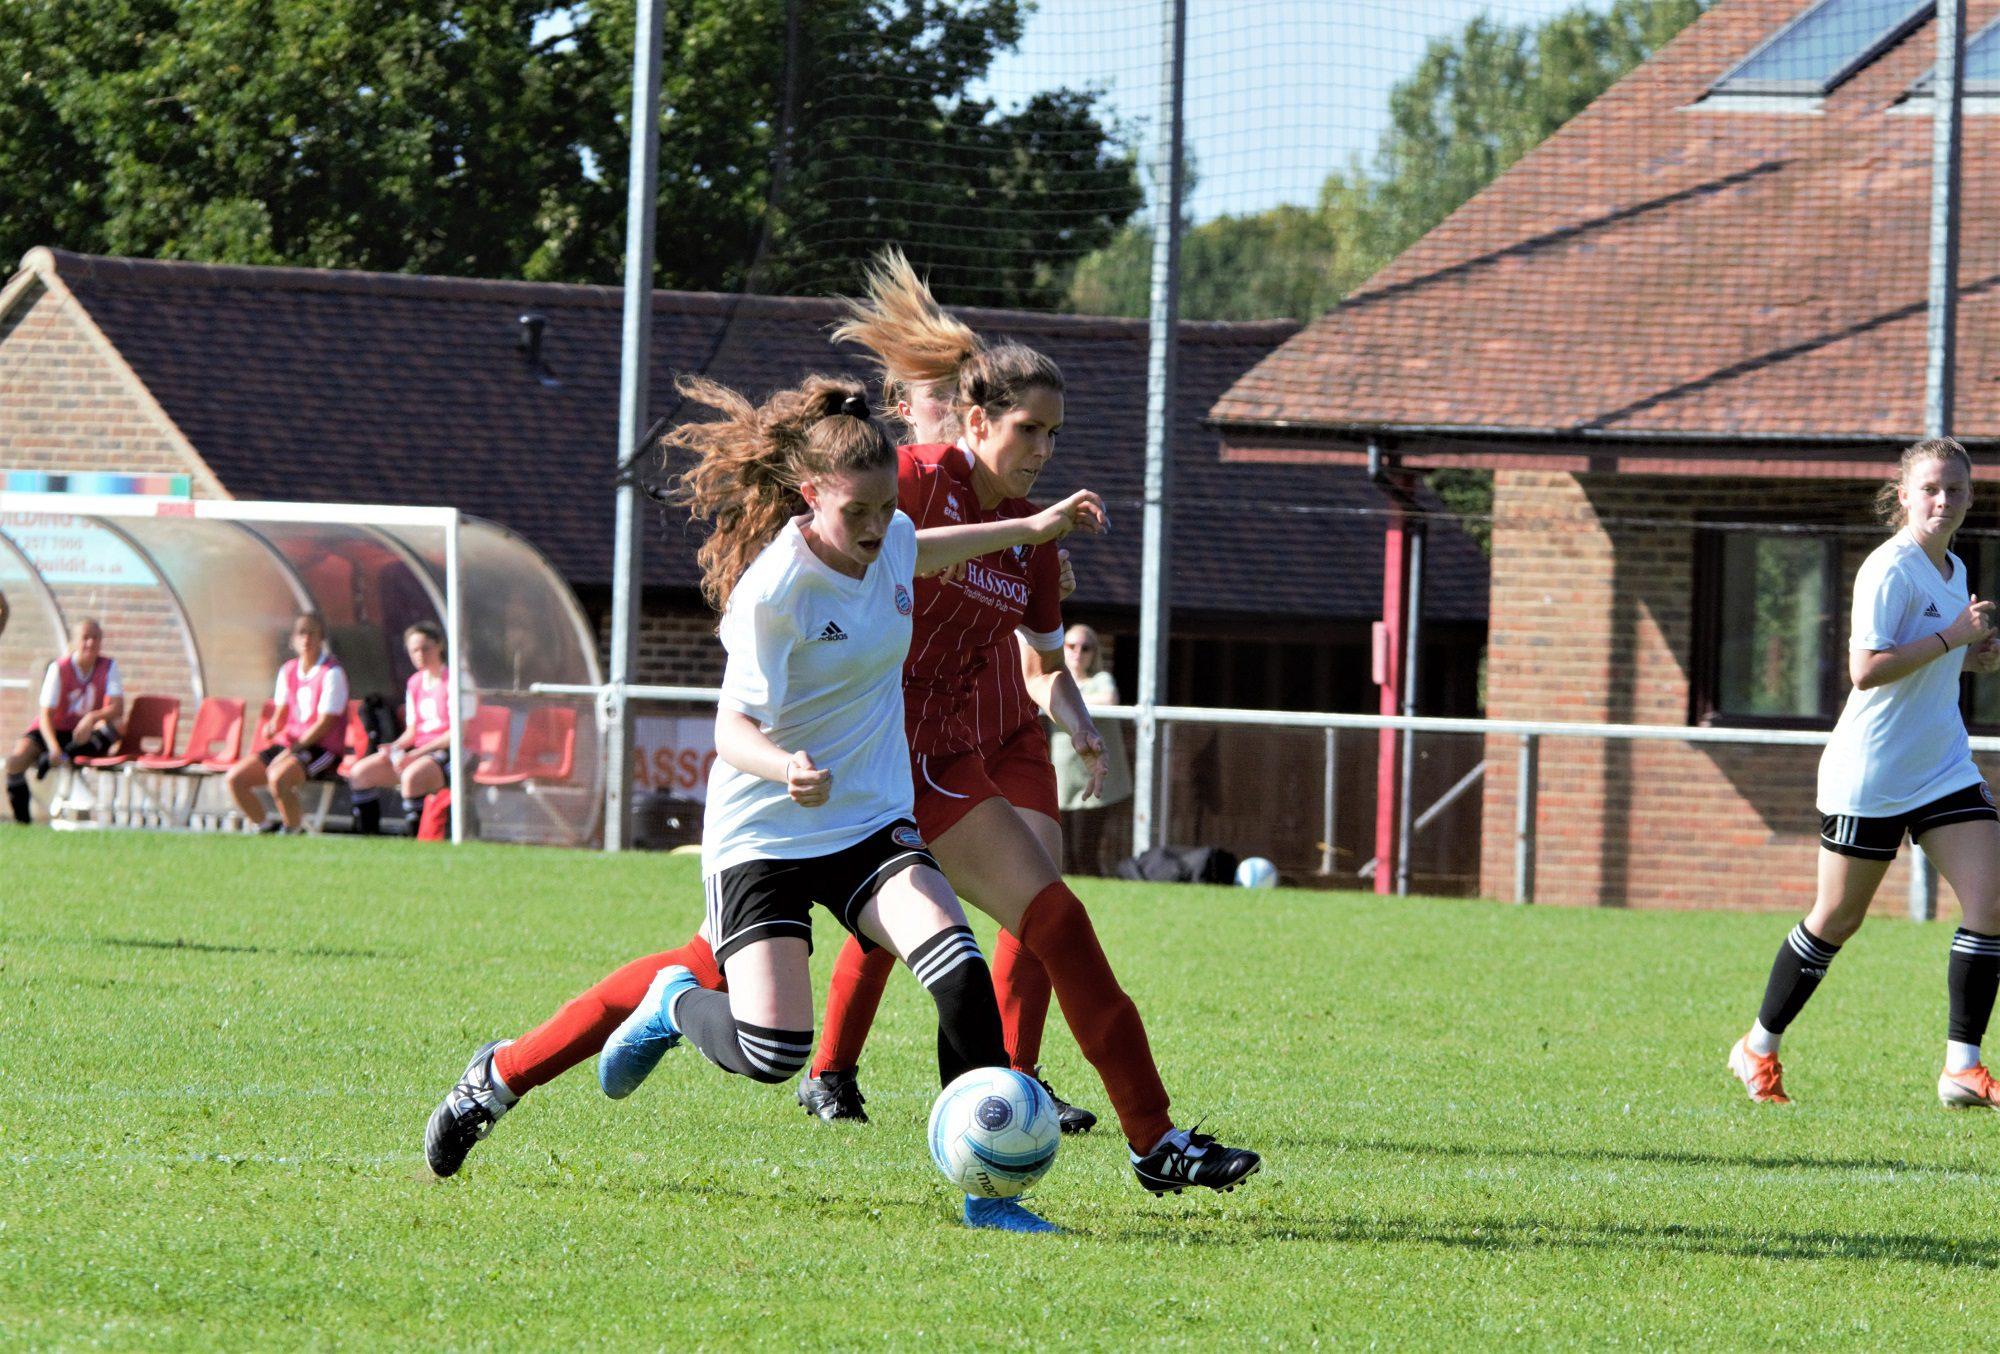 Read the full article - Relentless Reds put ten past Hassocks